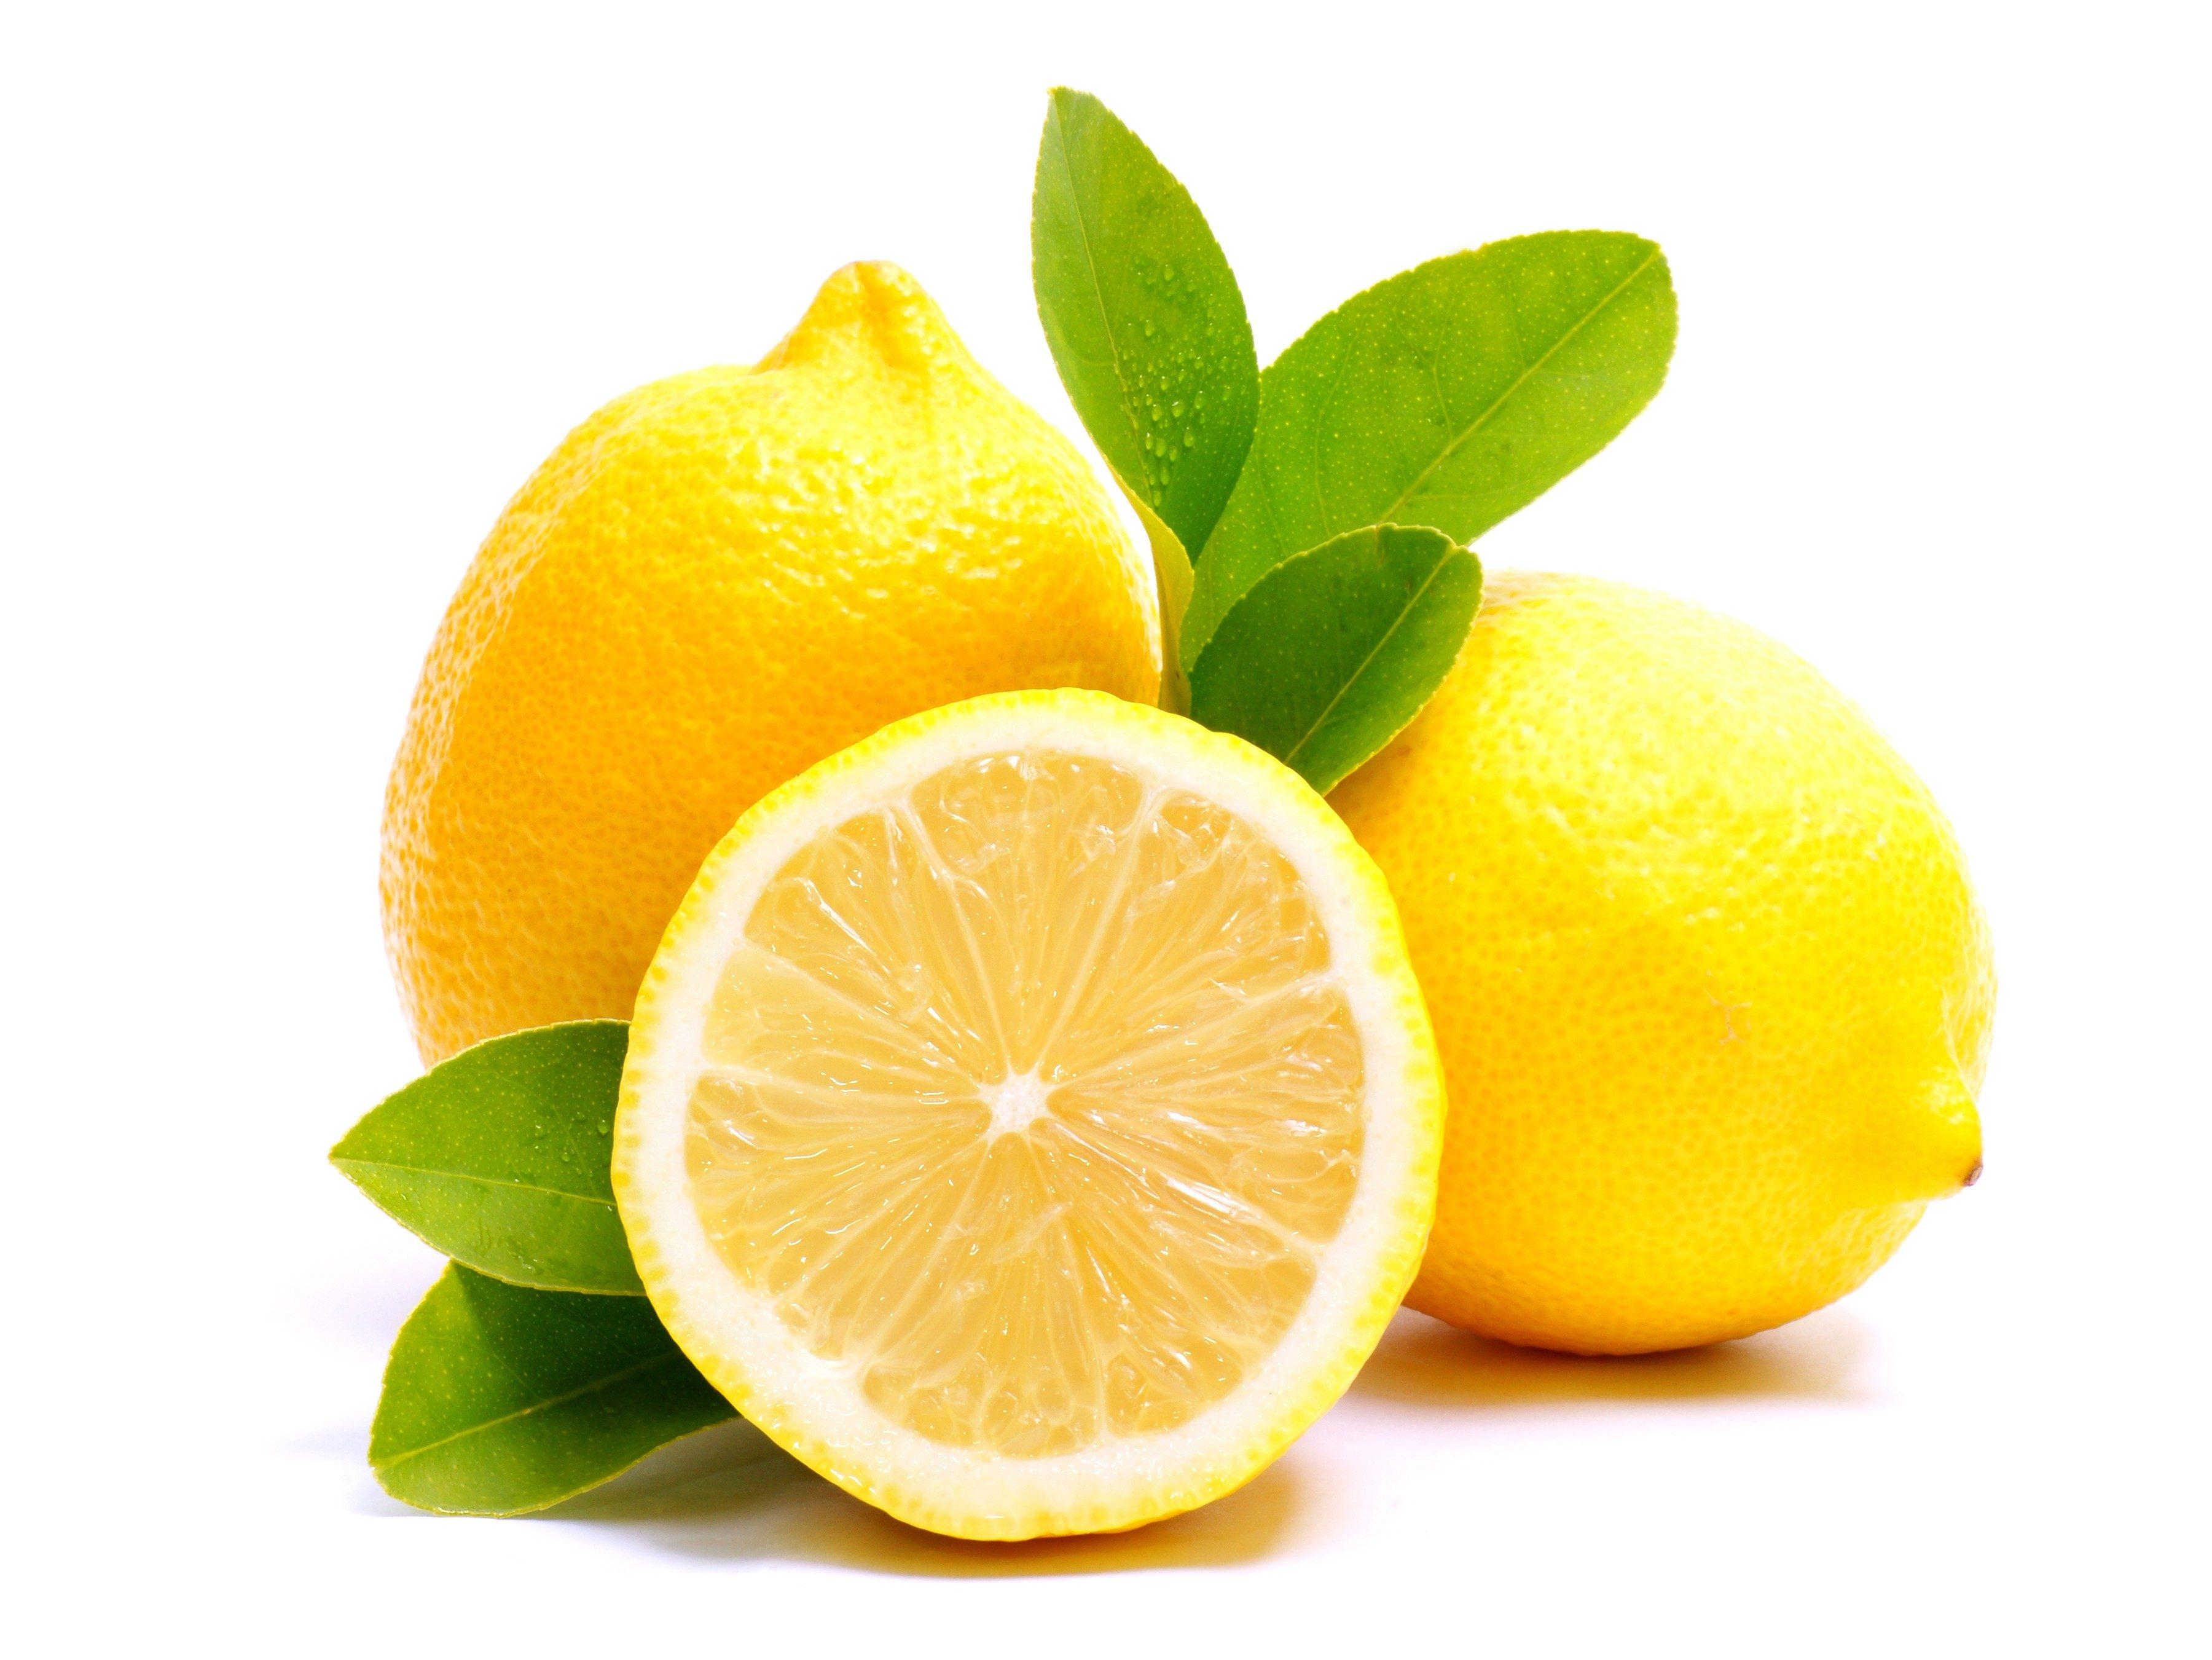 3. Suck on a lemon